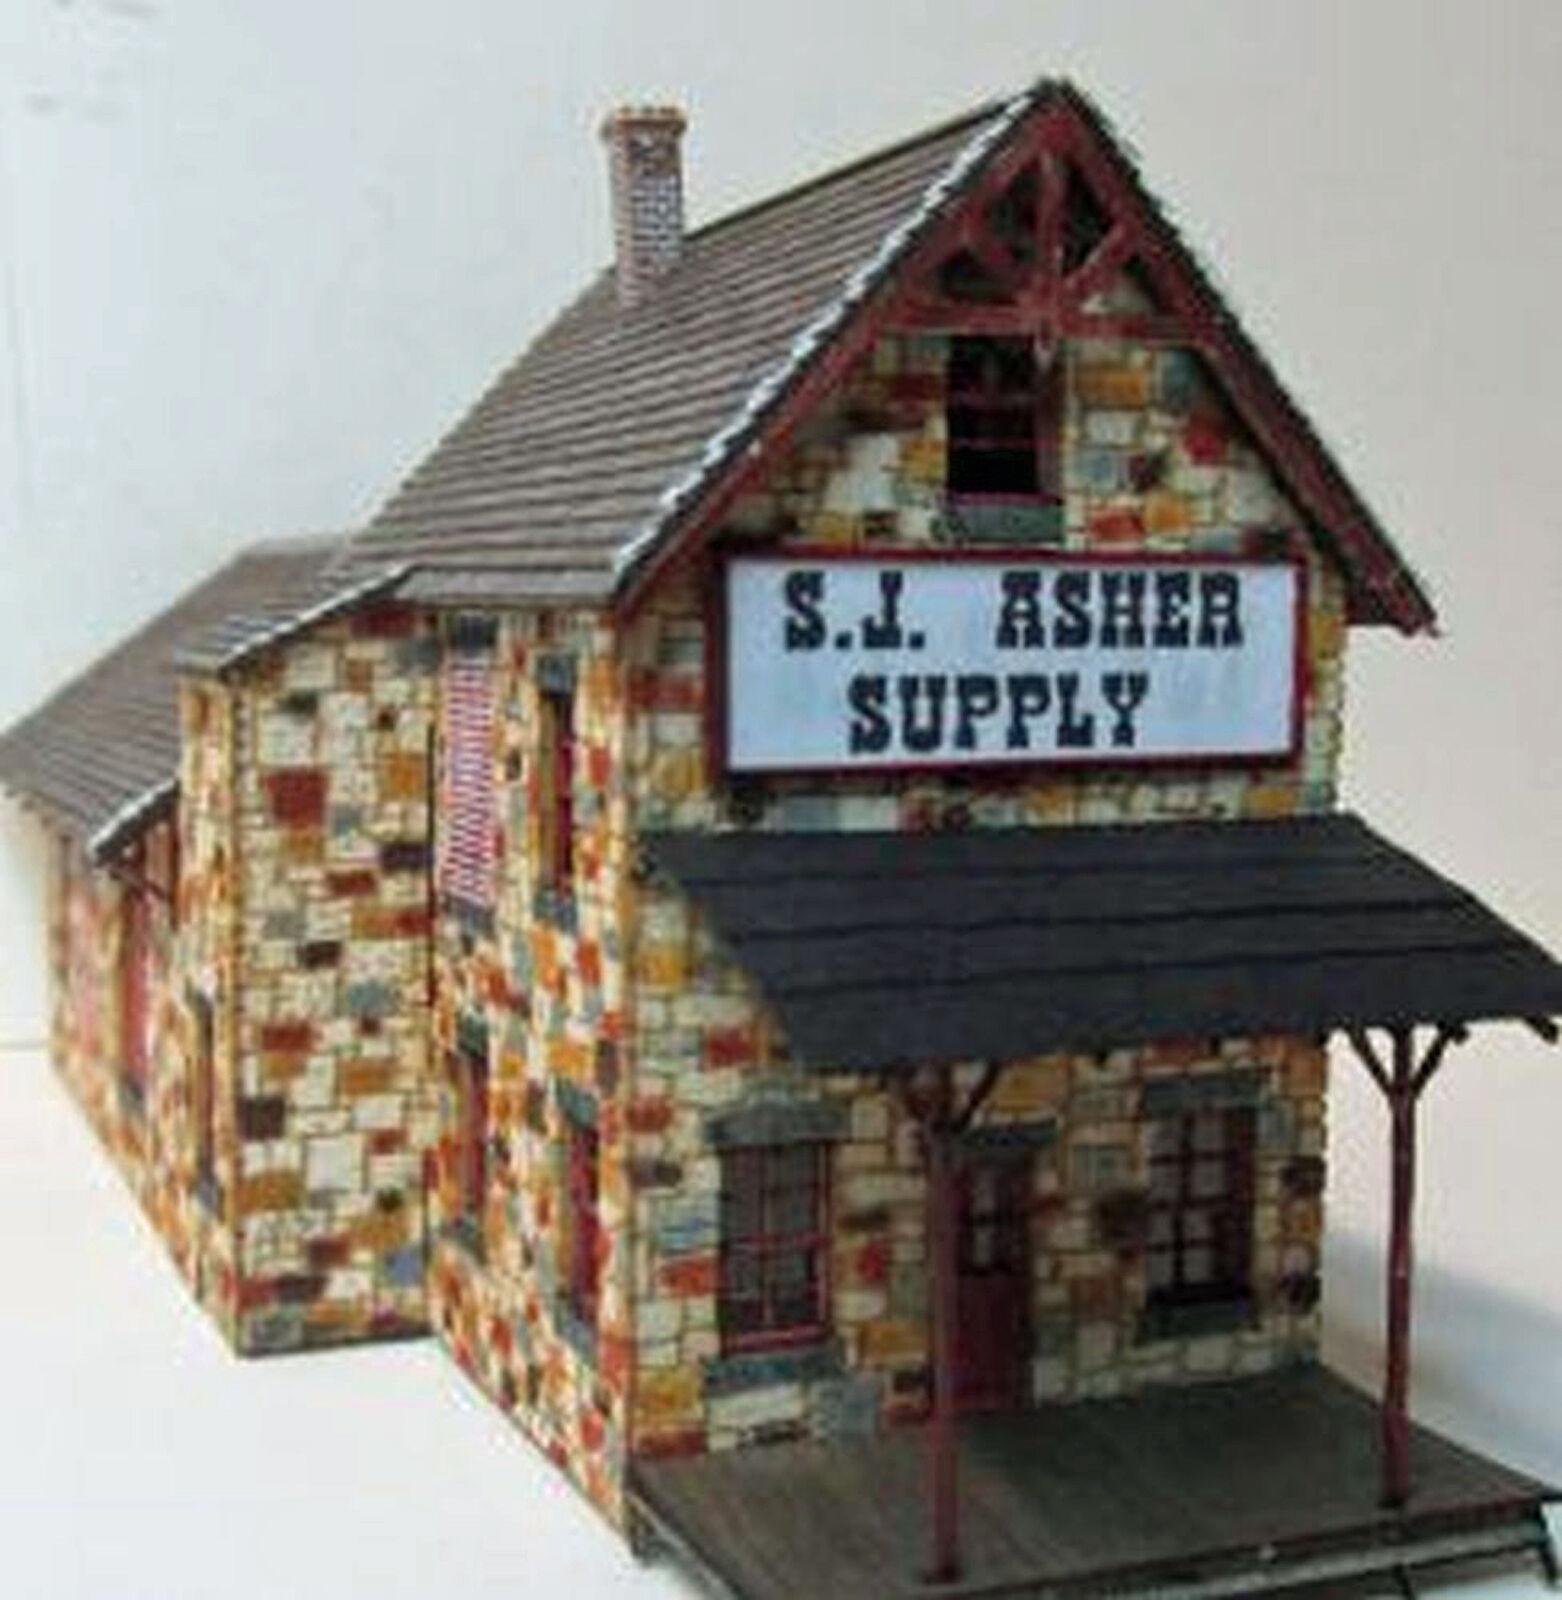 S.J. ASHER SUPPLY N Scale Model Railroad Structure Unptd Wood Laser Kit RSL3062